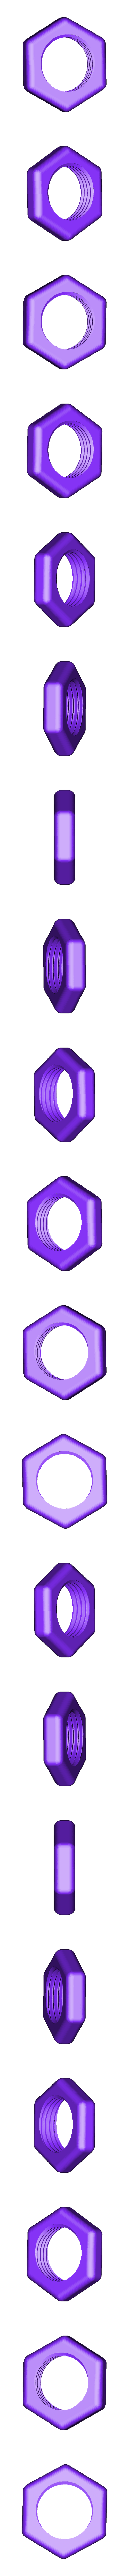 ecrou bride.stl Download STL file Articulated support camera , photo , video , creality ender 3 standard screws photo • 3D printable template, benj2365